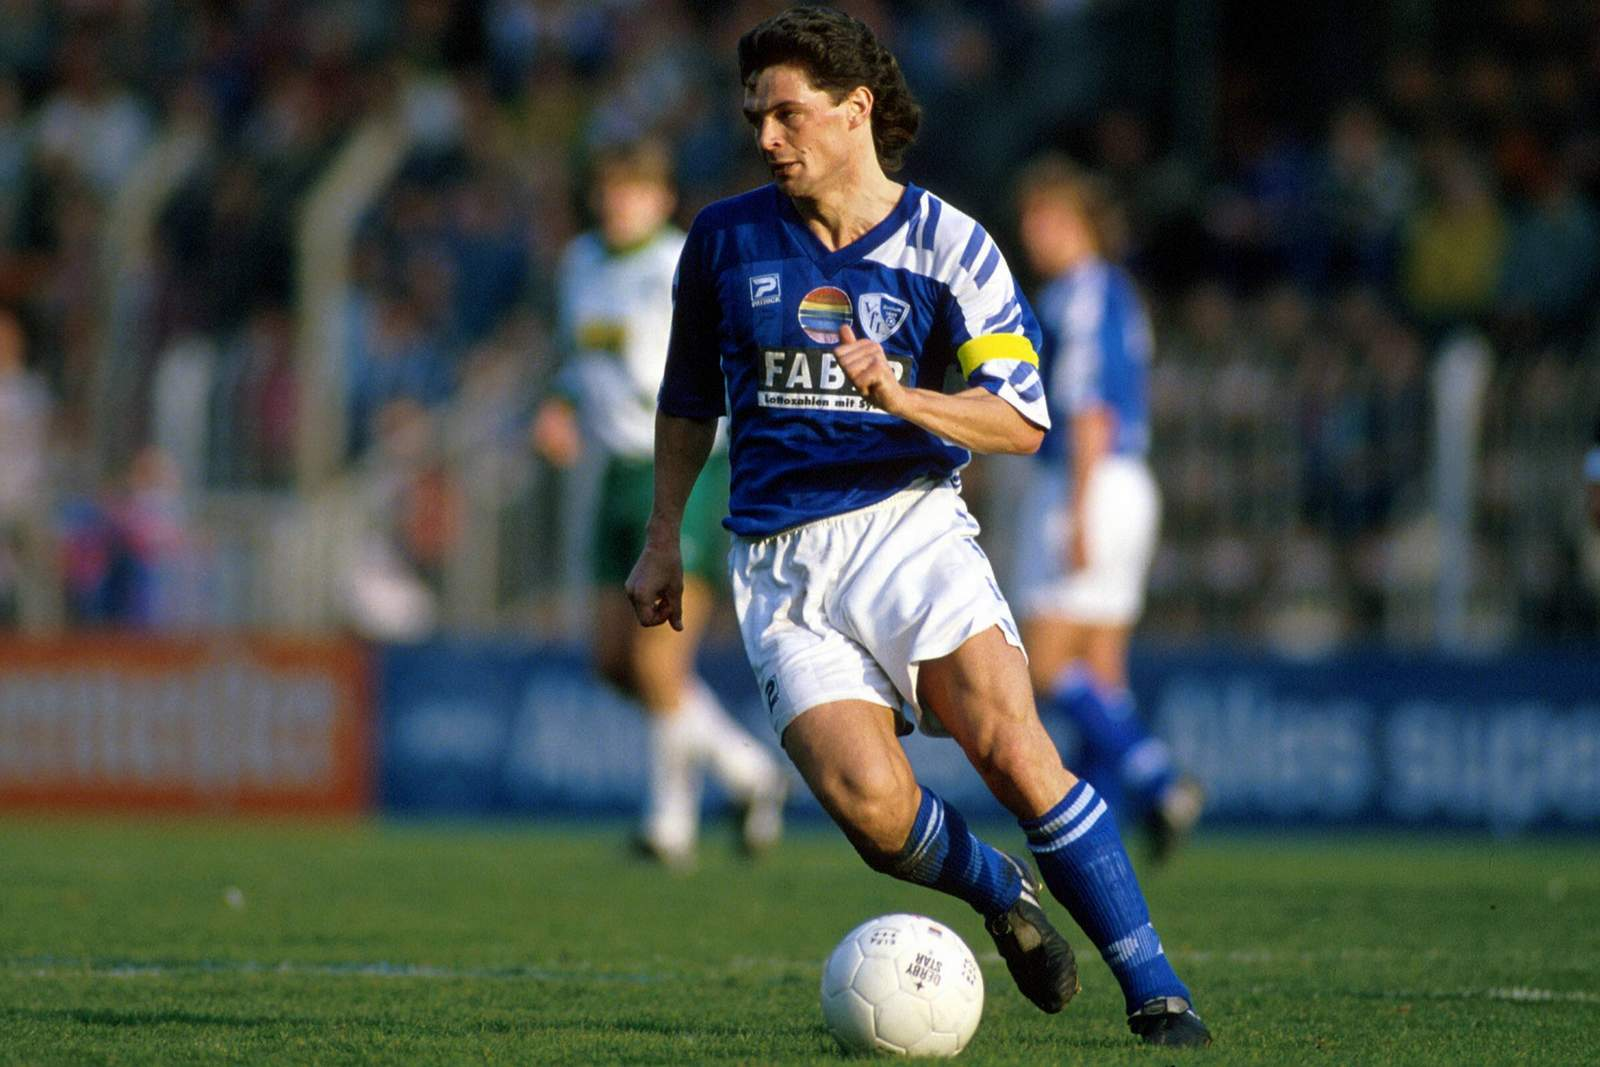 Uwe Wegmann im Trikot des VfL Bochum.